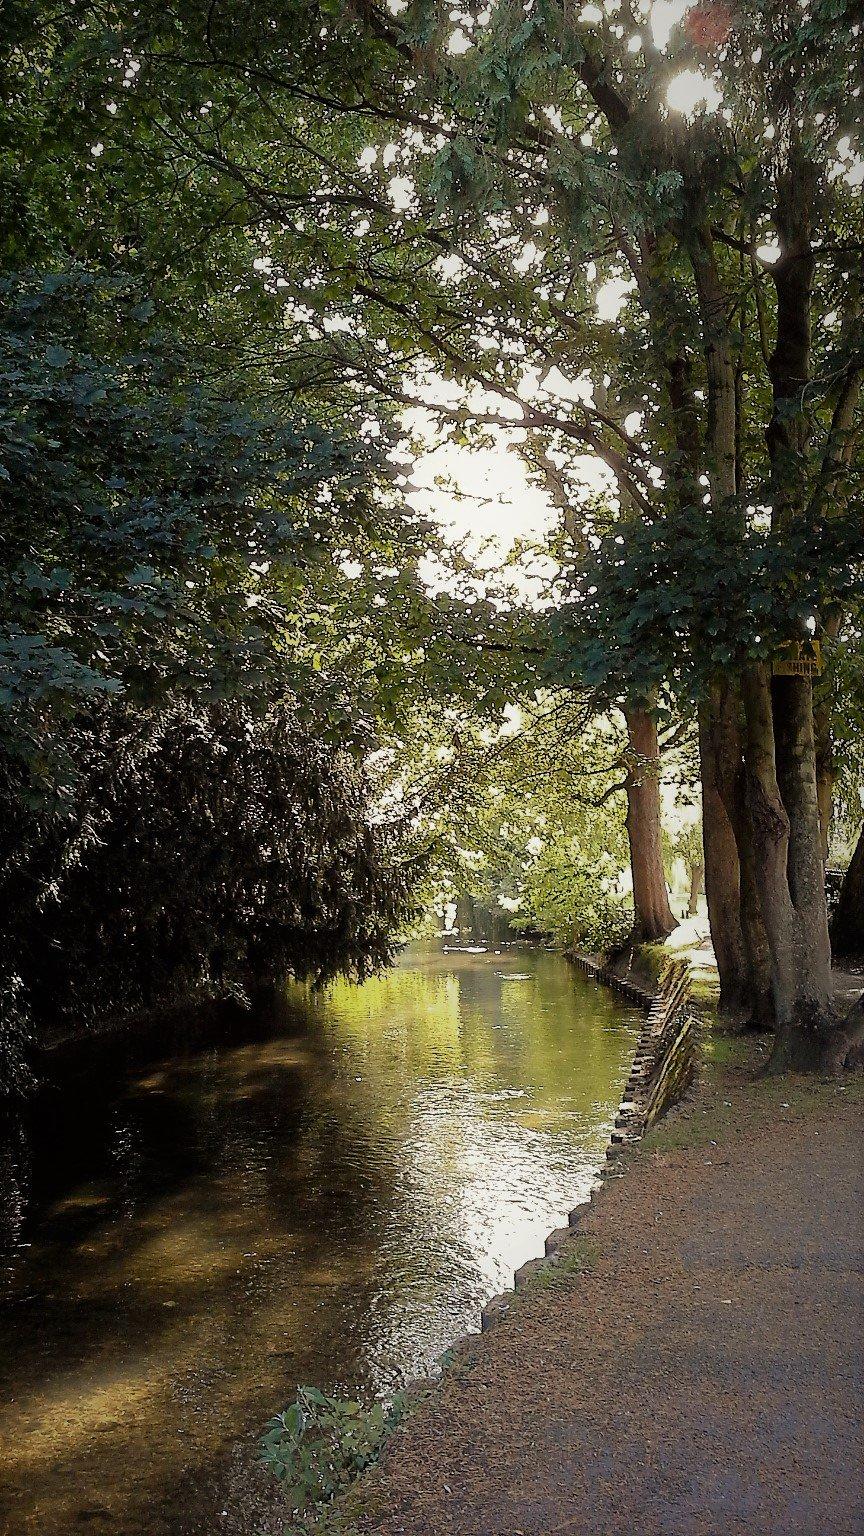 bosco e fiume avon